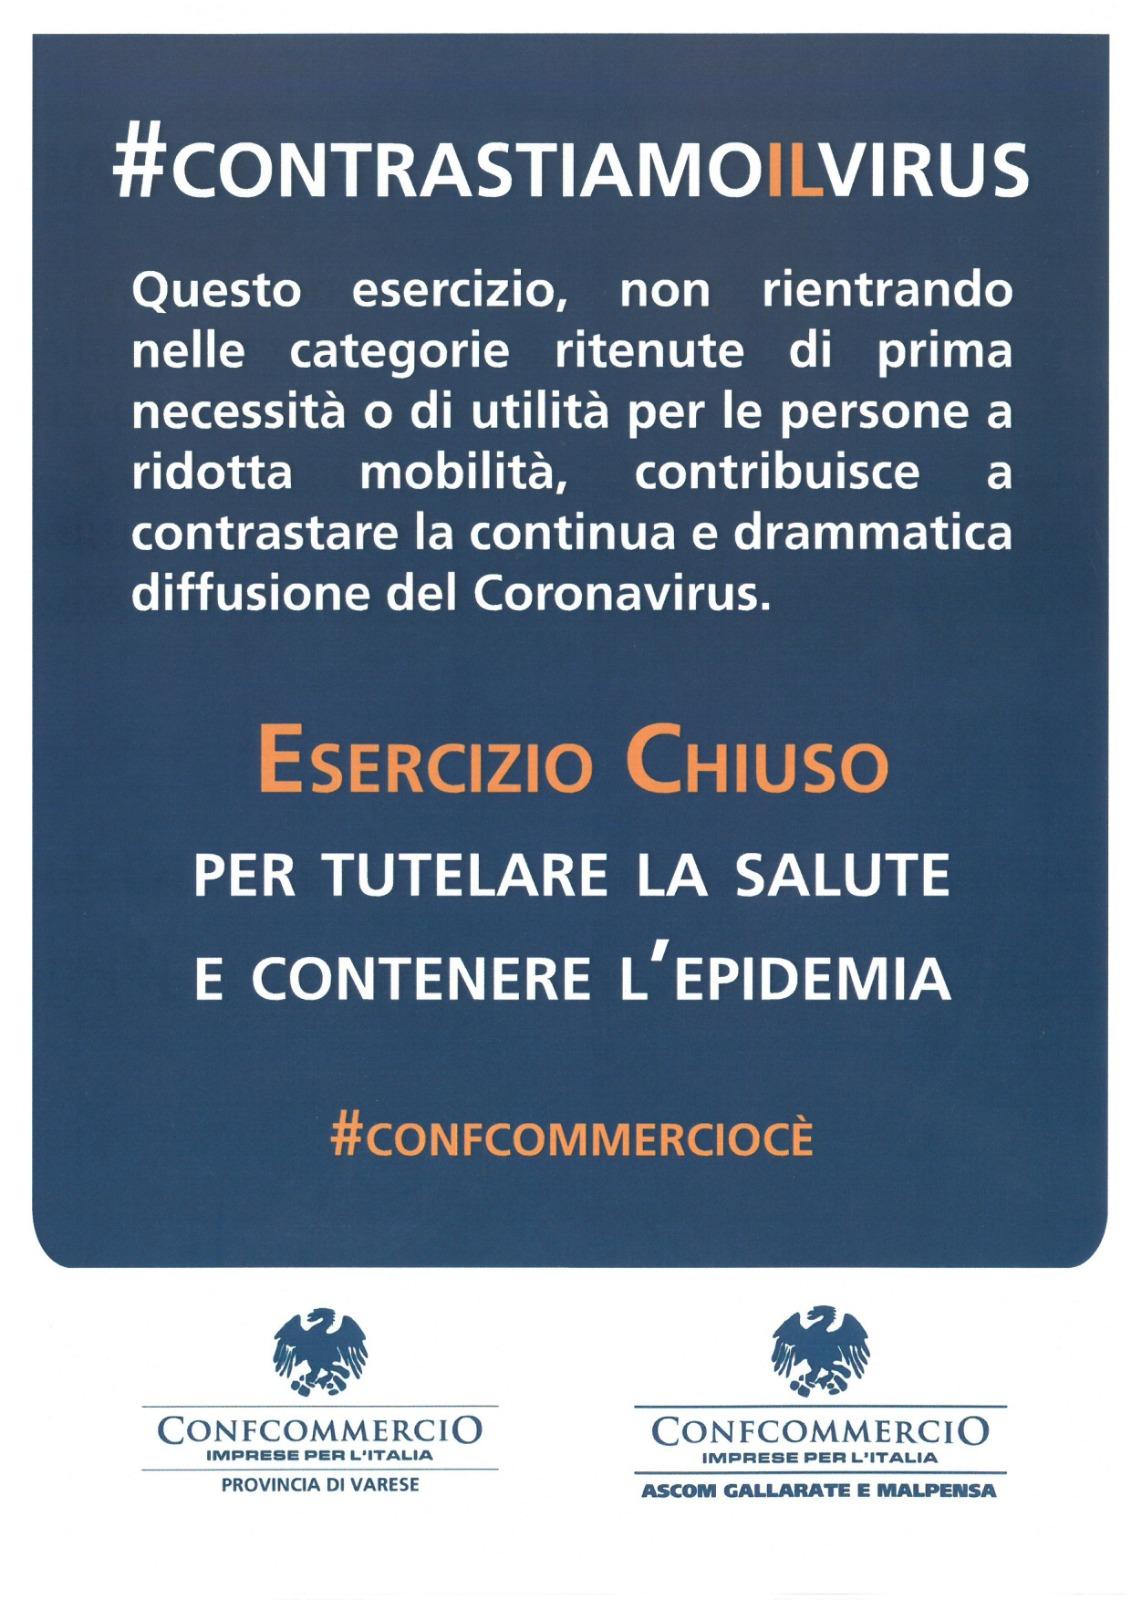 #contrastiamoilvirus